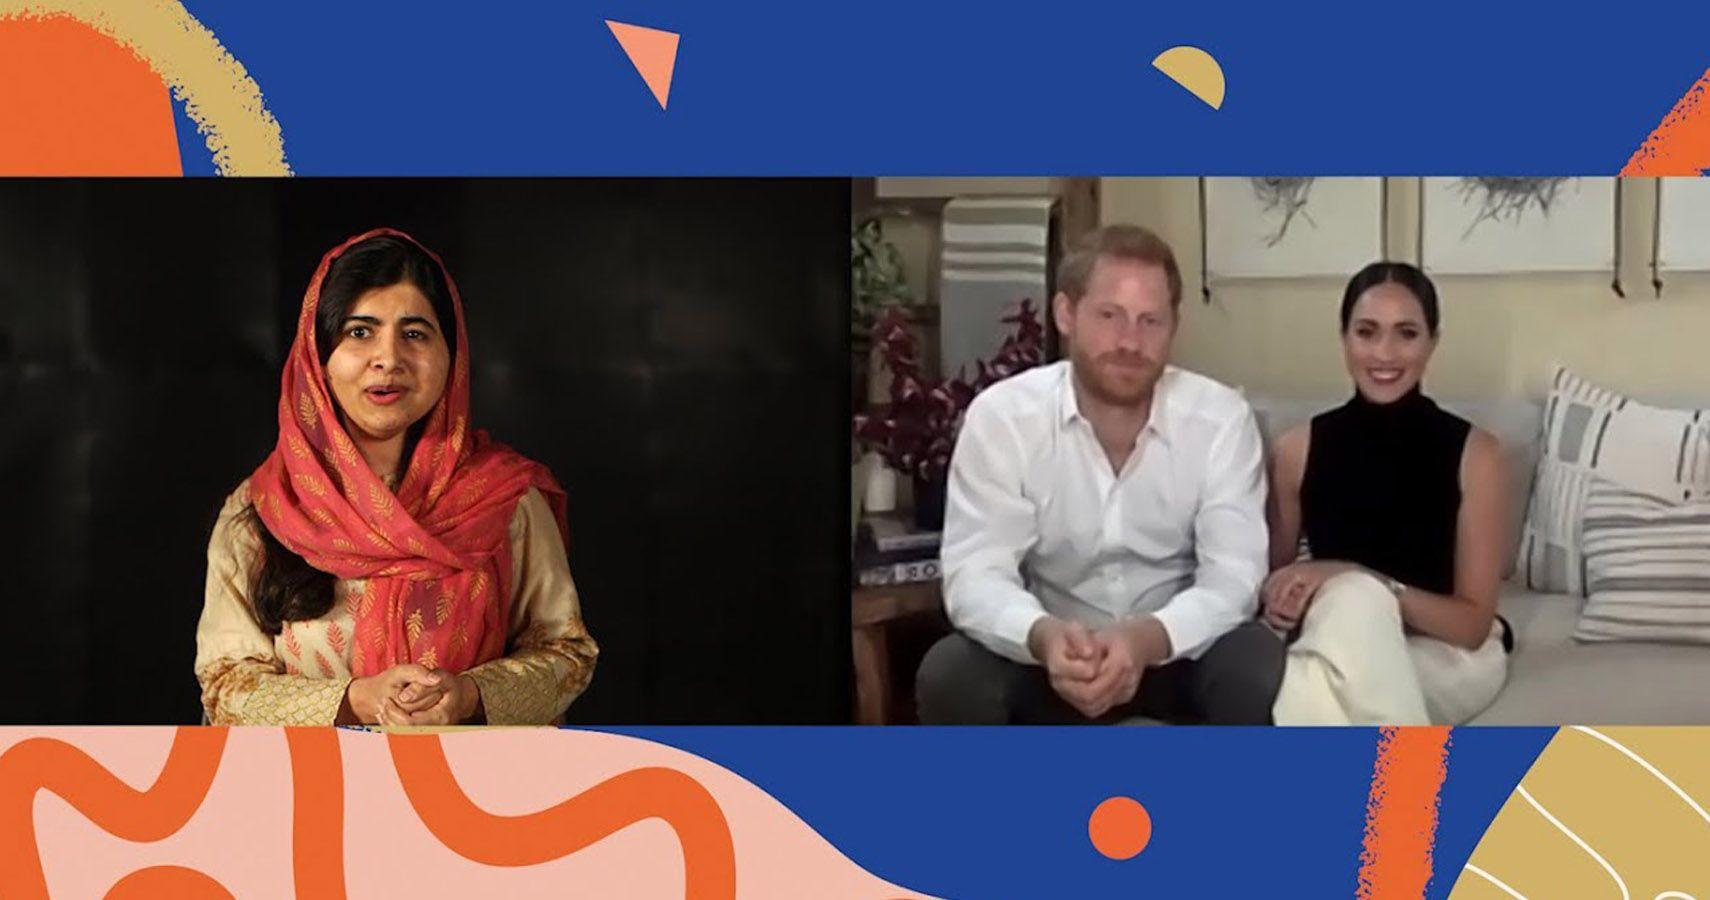 Girls' Education Is At Risk, Say Meghan Markle & Malala Yousafzai